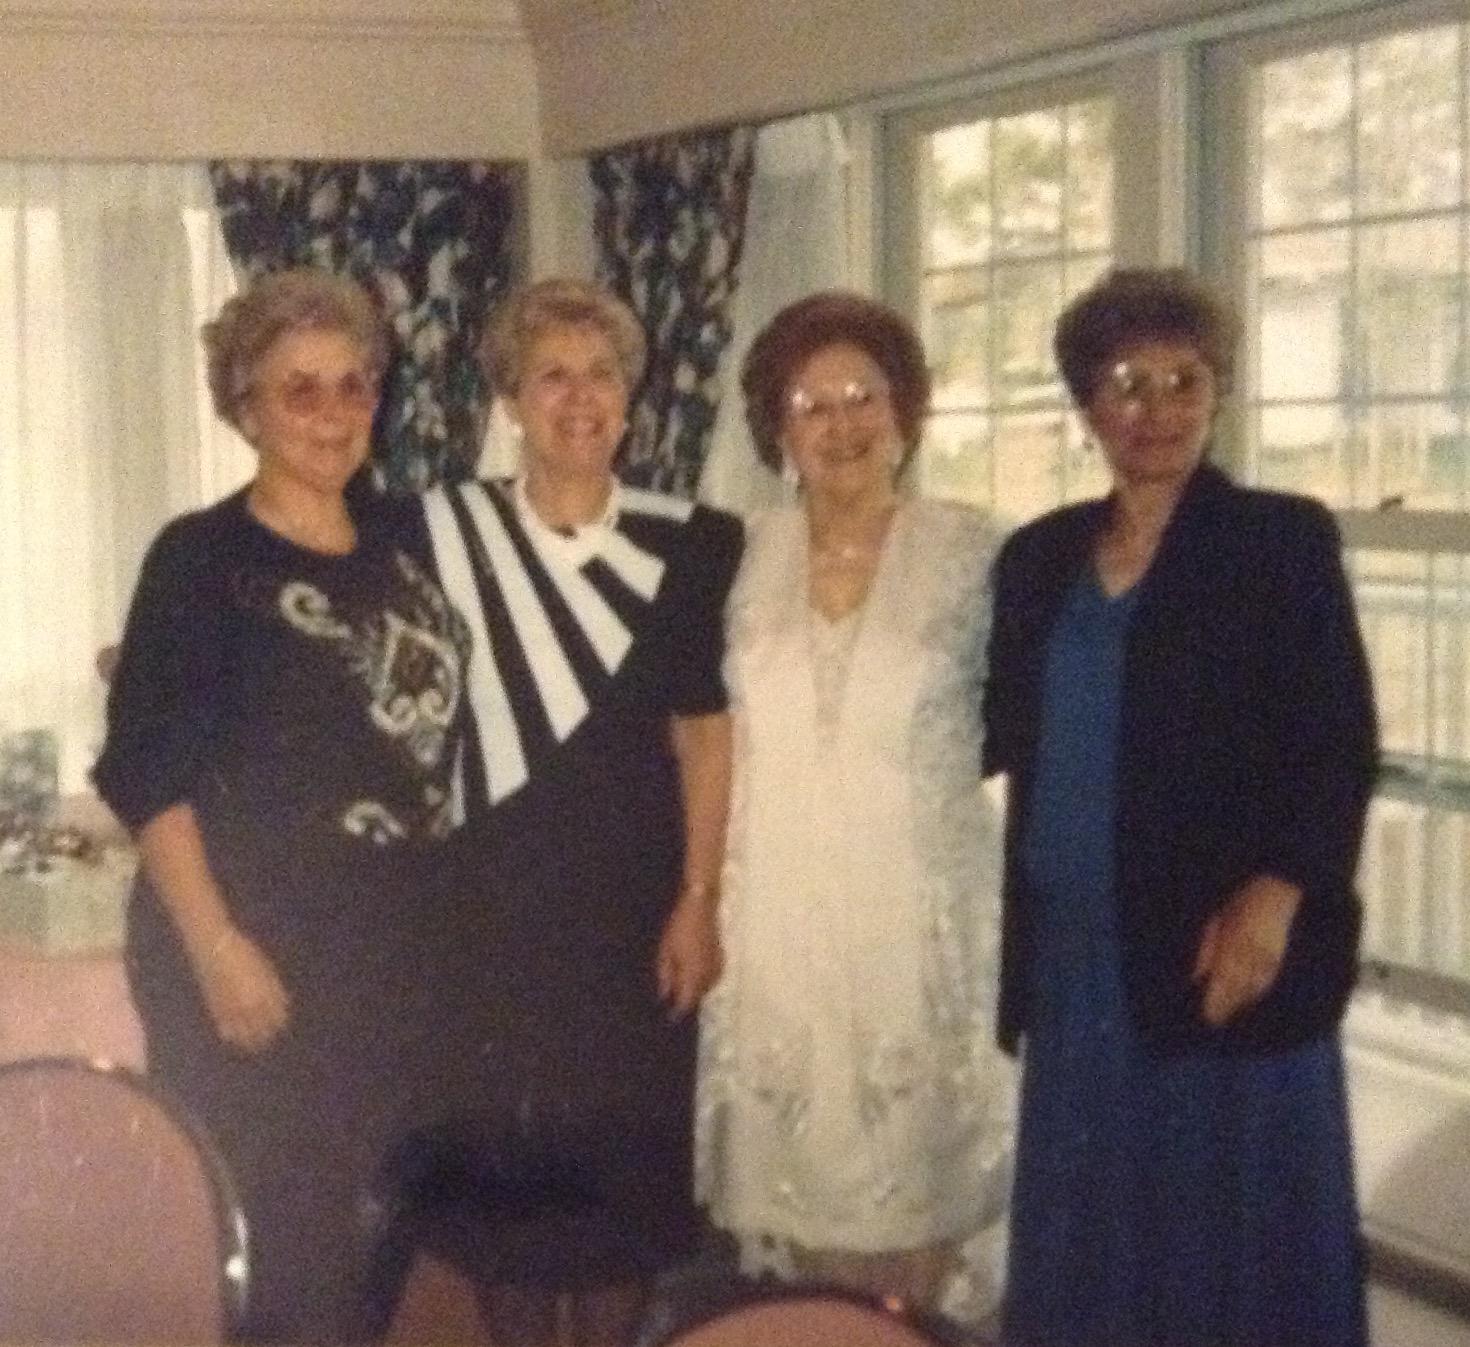 Jean, Anna, Angelina, Mary - the 4 Amico sisters